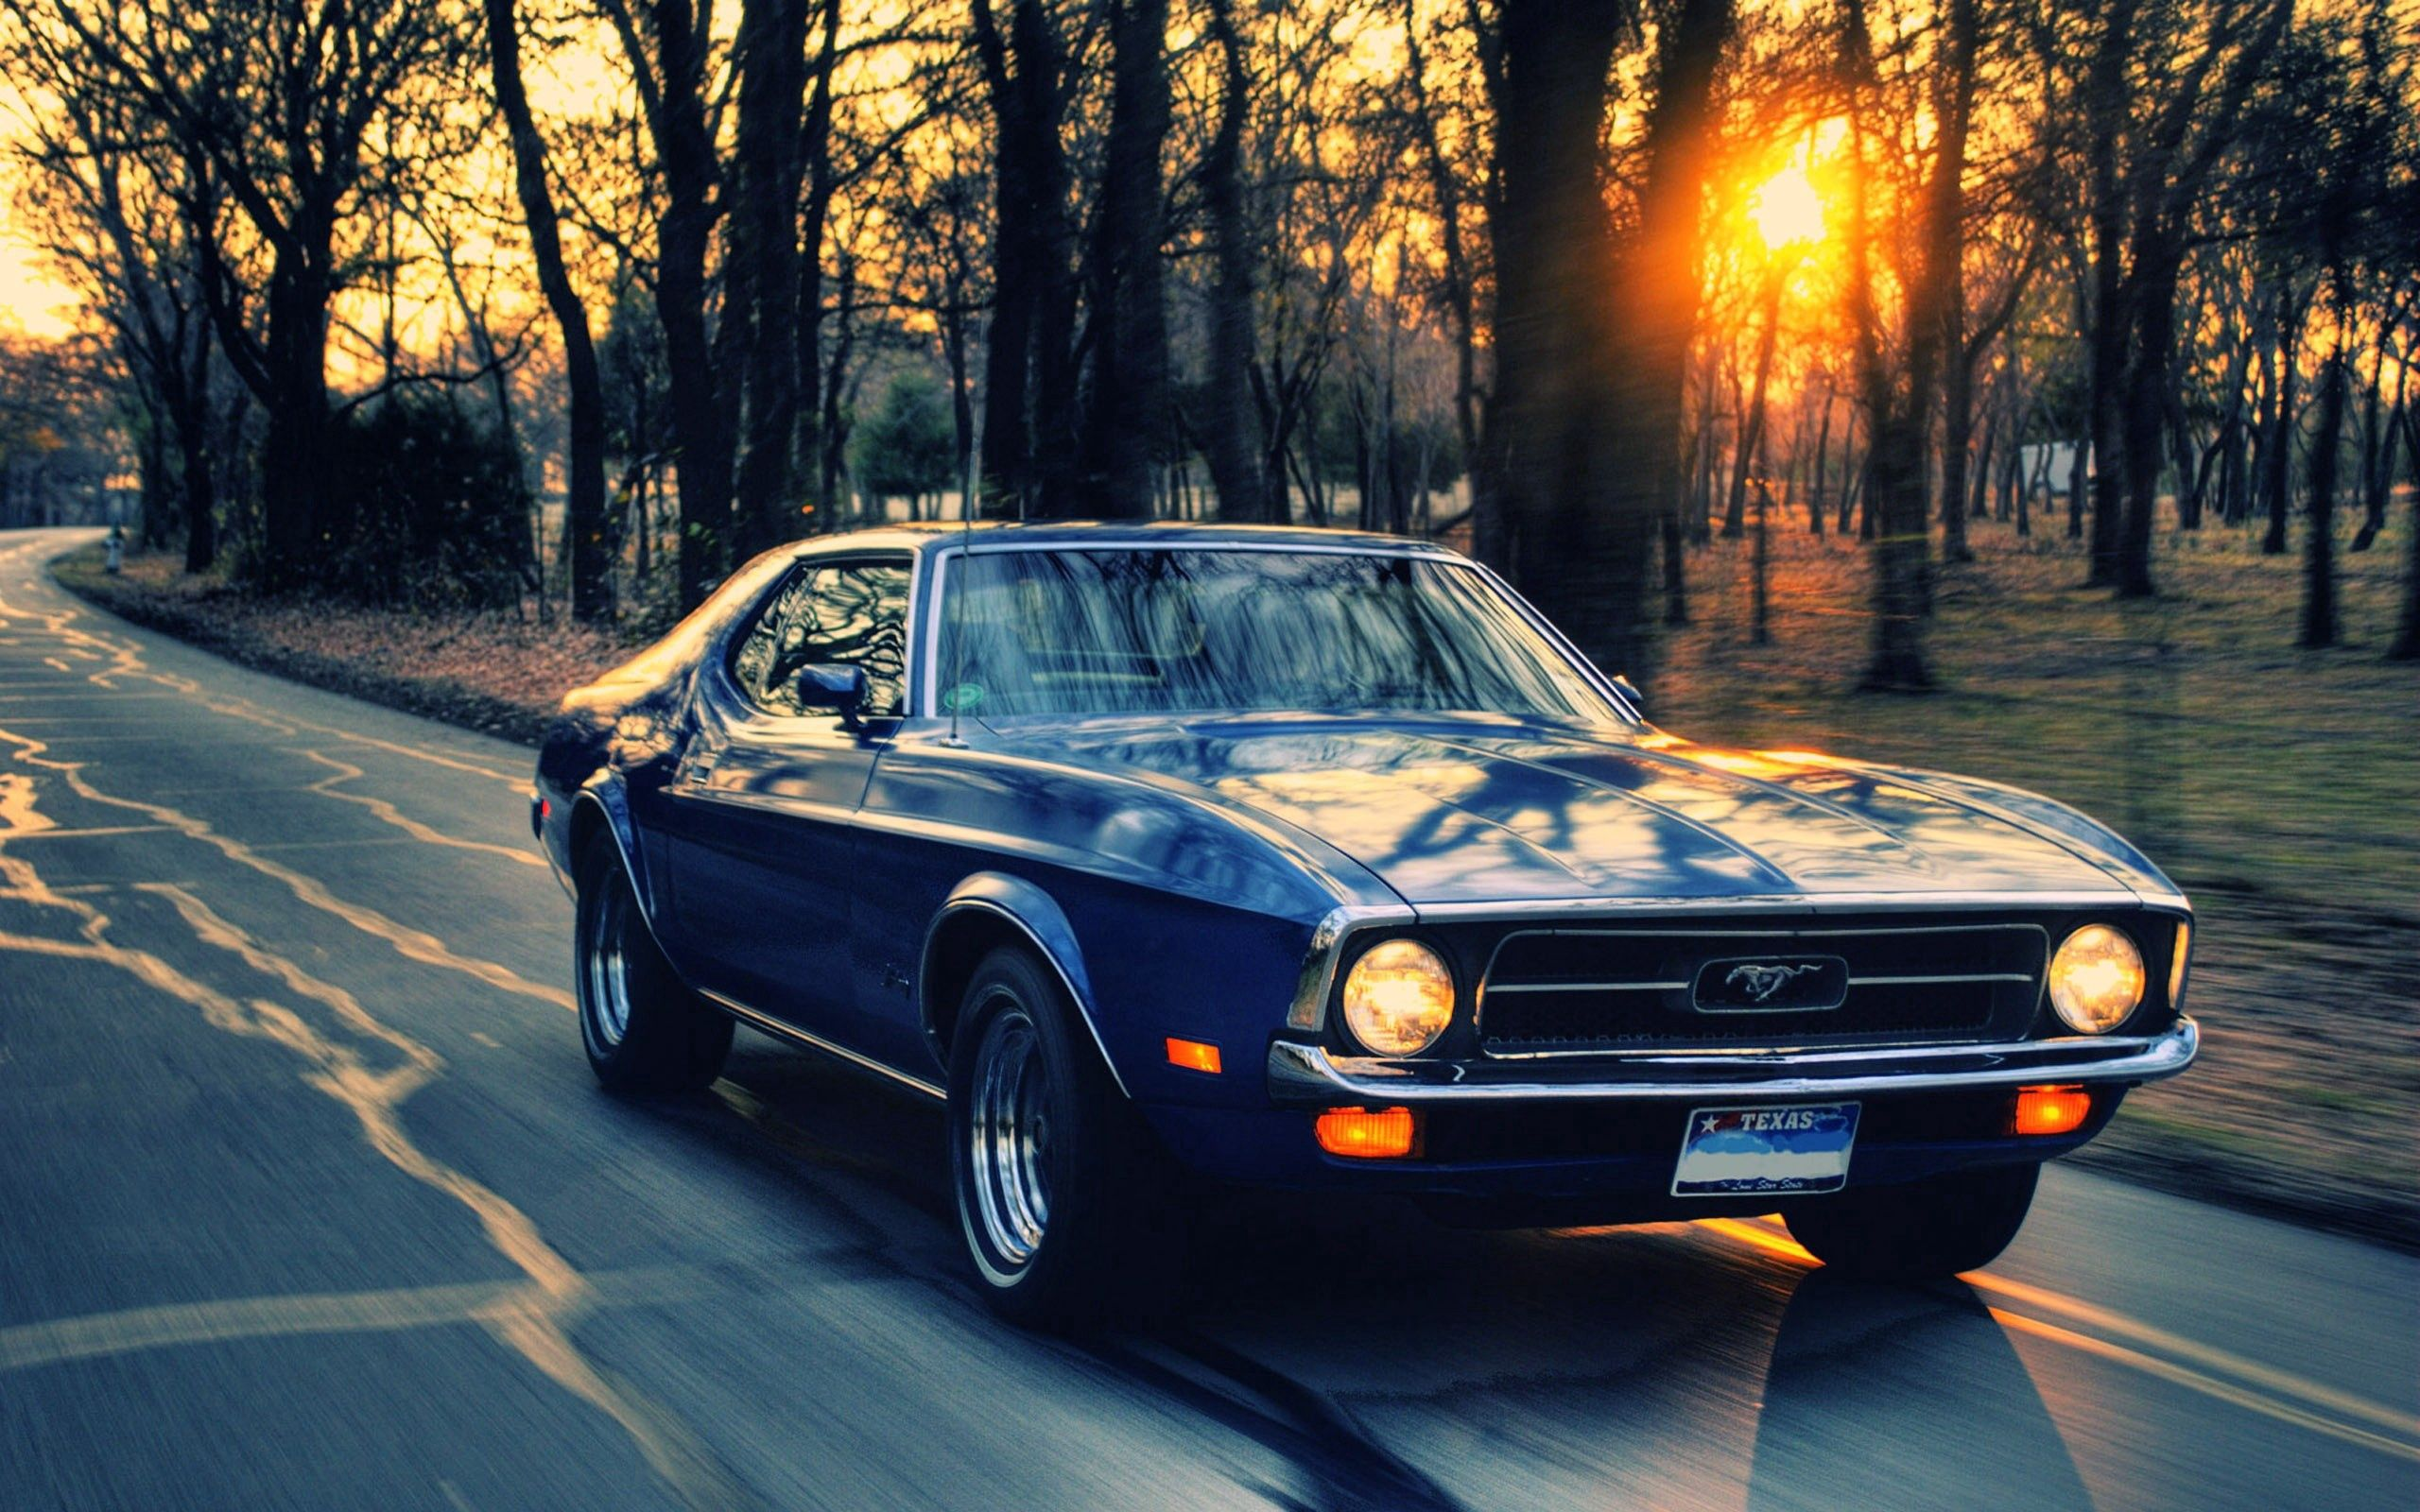 69515 descargar fondo de pantalla Coches, Ford Mustang, Automóvil, Tráfico, Movimiento: protectores de pantalla e imágenes gratis